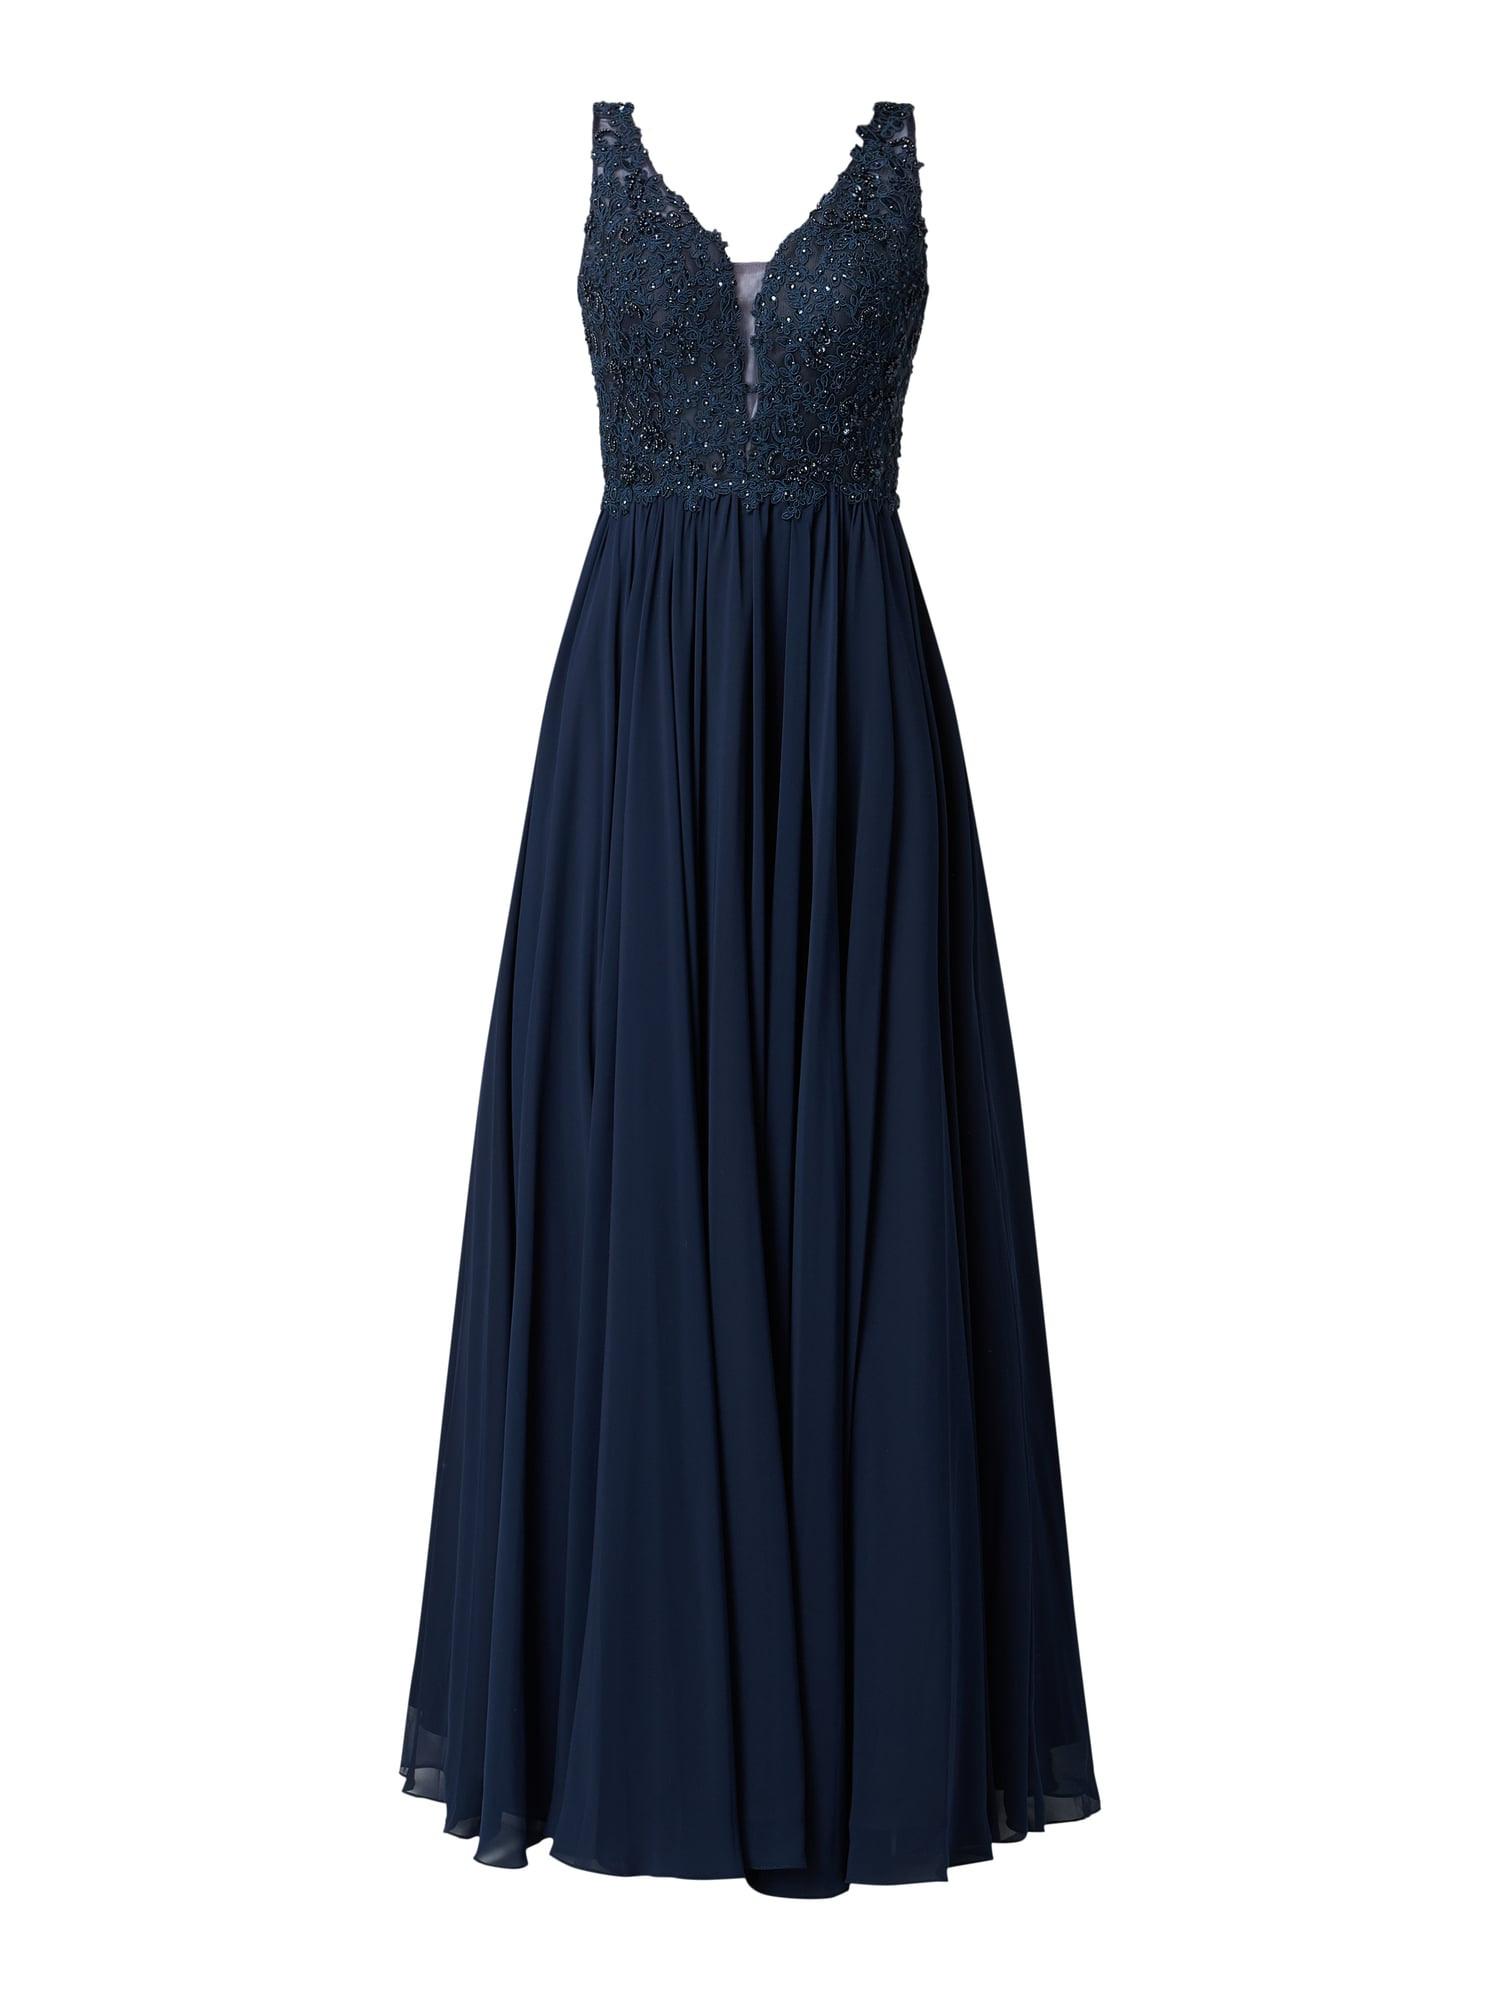 20 Genial Unique Abendkleid Blau BoutiqueFormal Wunderbar Unique Abendkleid Blau Design